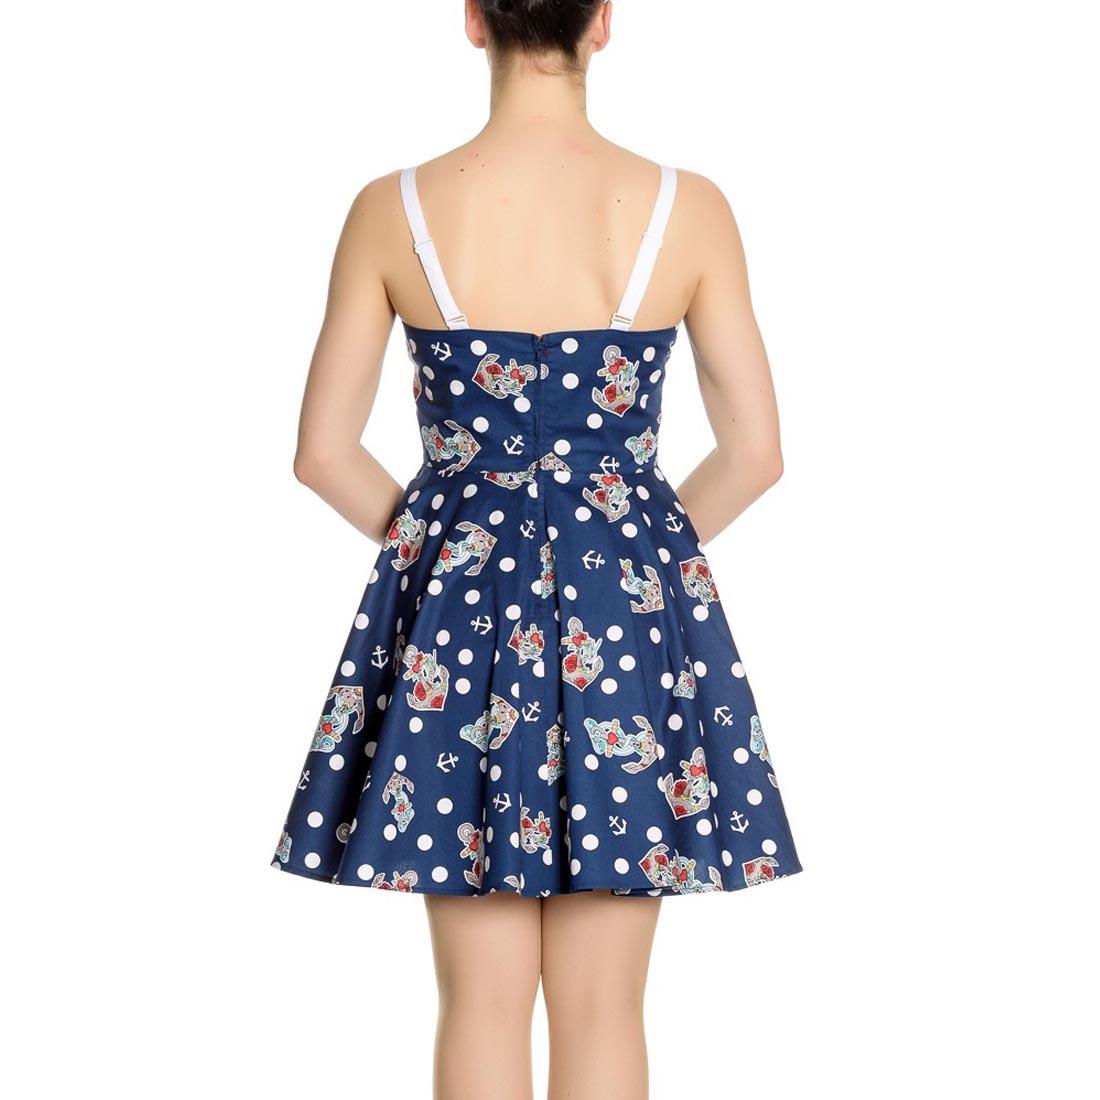 Hell-Bunny-Navy-Blue-50s-Nautical-Mini-Dress-OCEANA-Polka-Dot-All-Sizes thumbnail 17